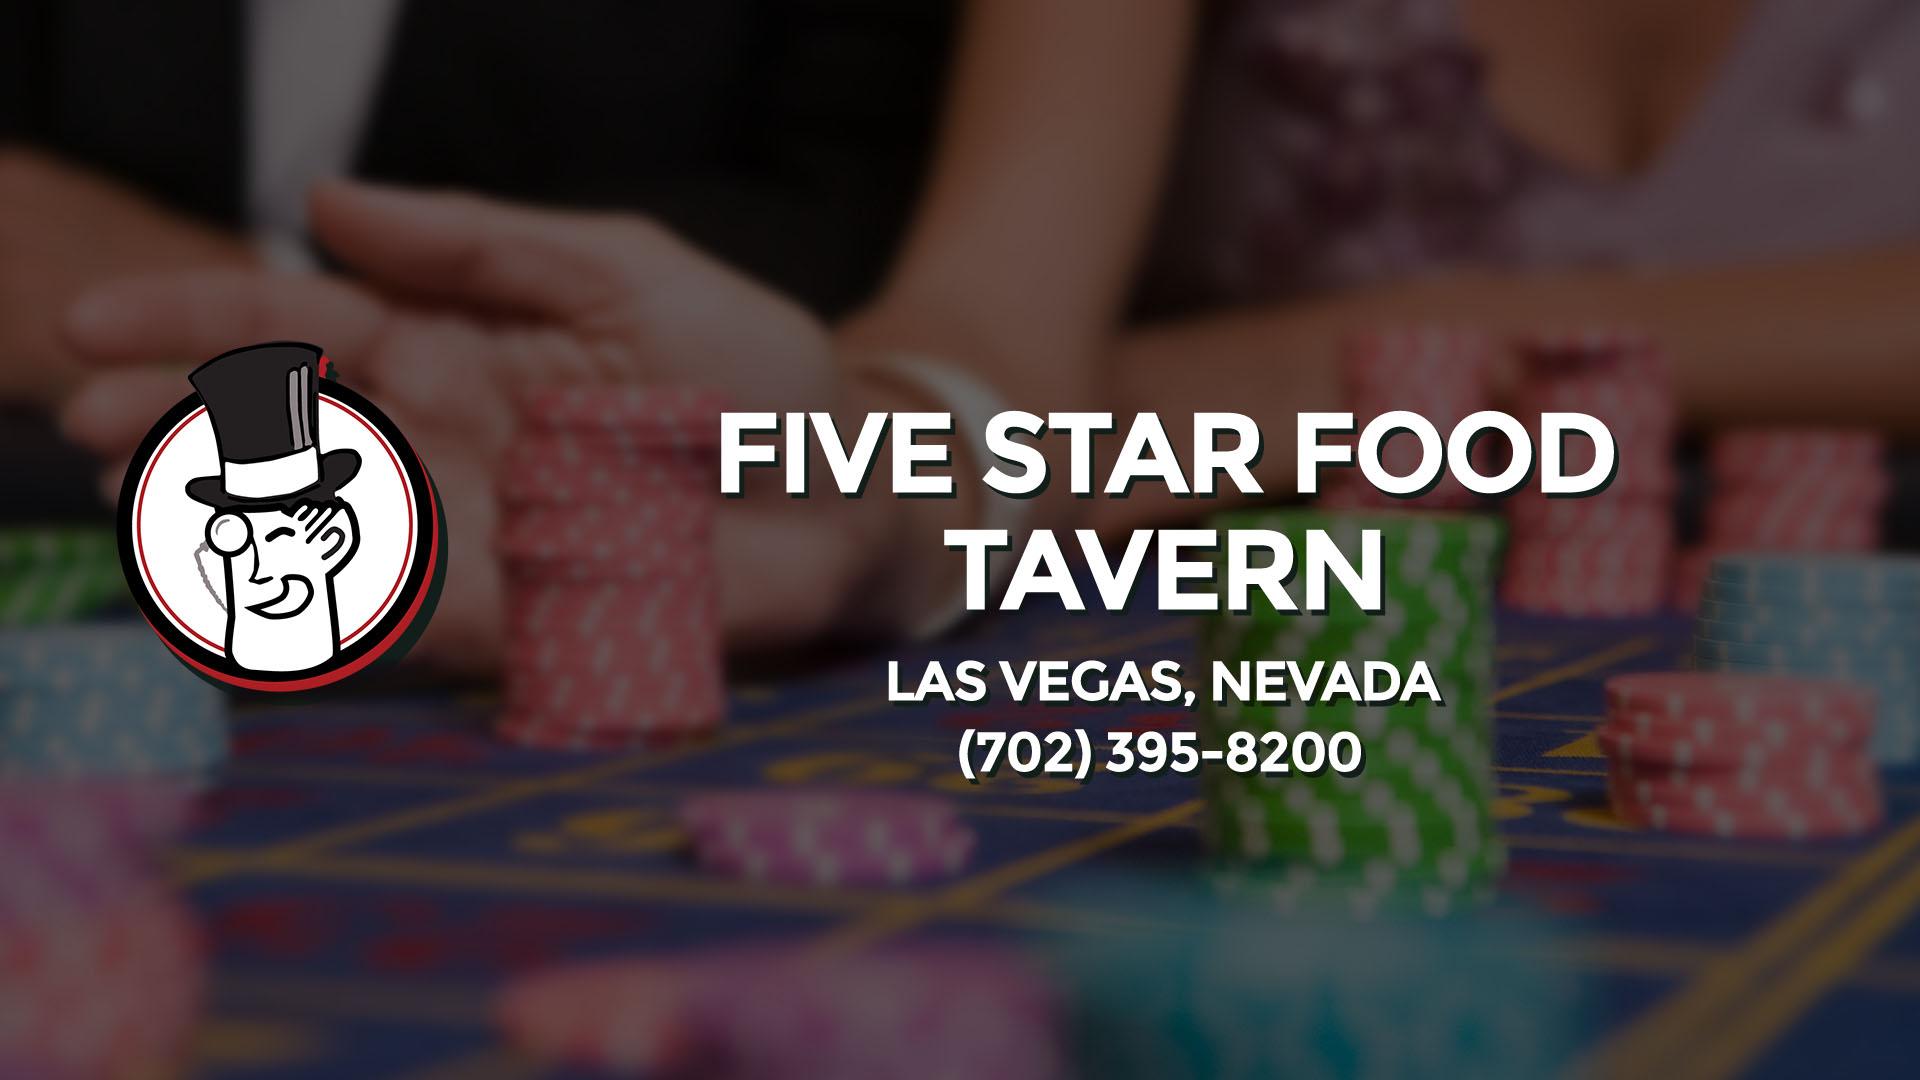 Barons Bus Casino Headers 2953 Five Star Food Tavern North